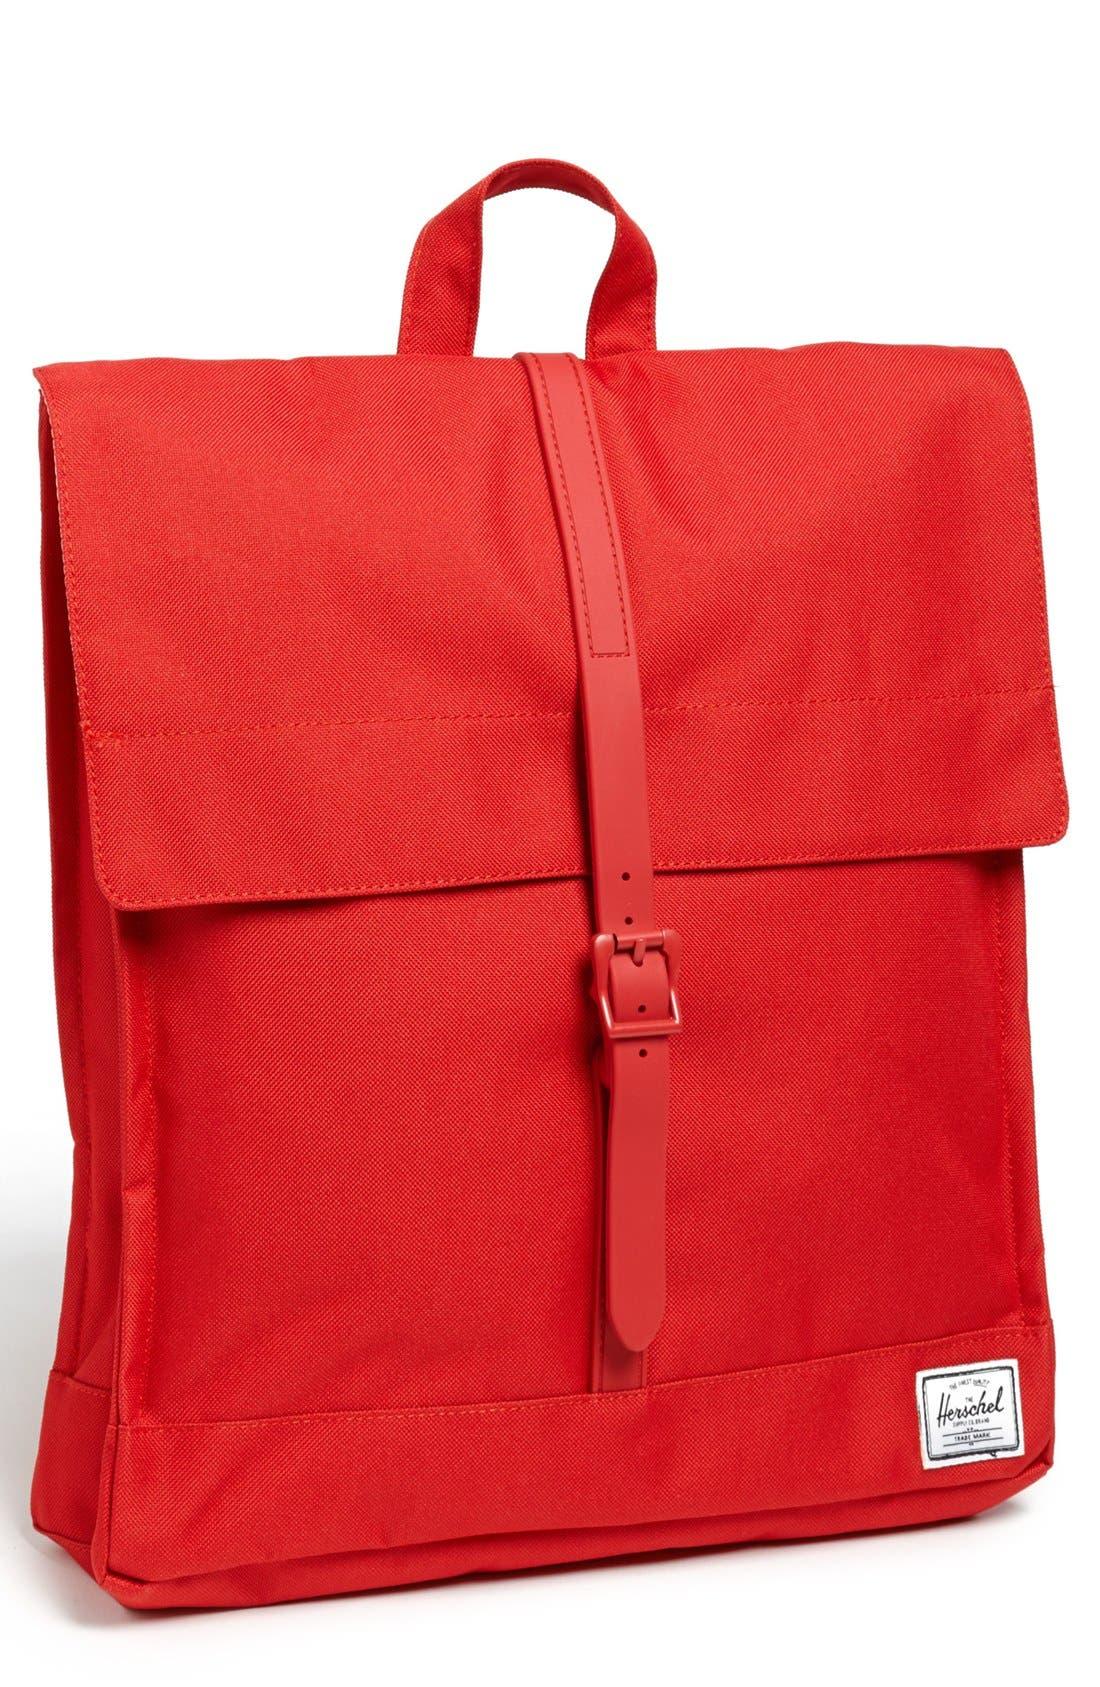 Main Image - Herschel Supply Co. 'City - Mid Volume' Backpack